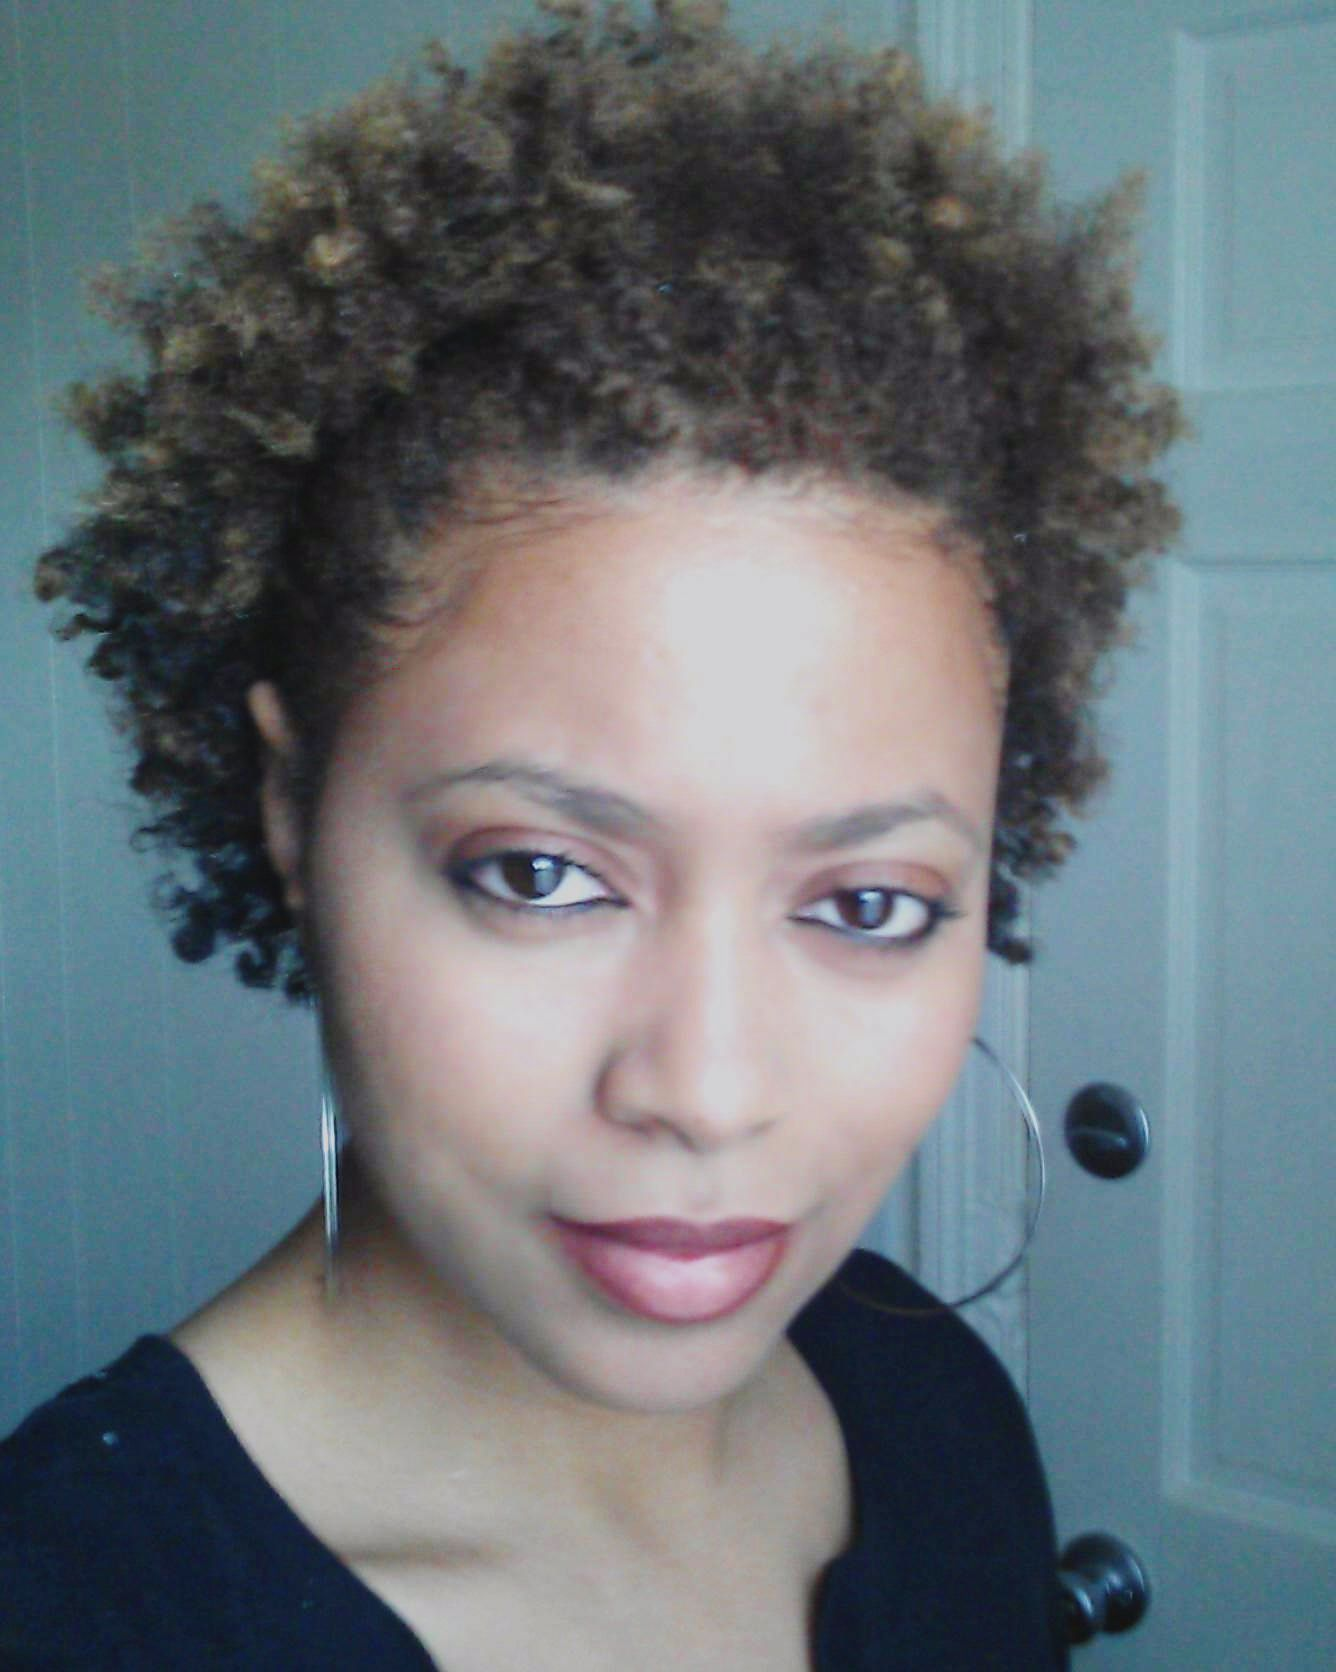 natural hair styles, twa | Twa hairstyles | Pinterest